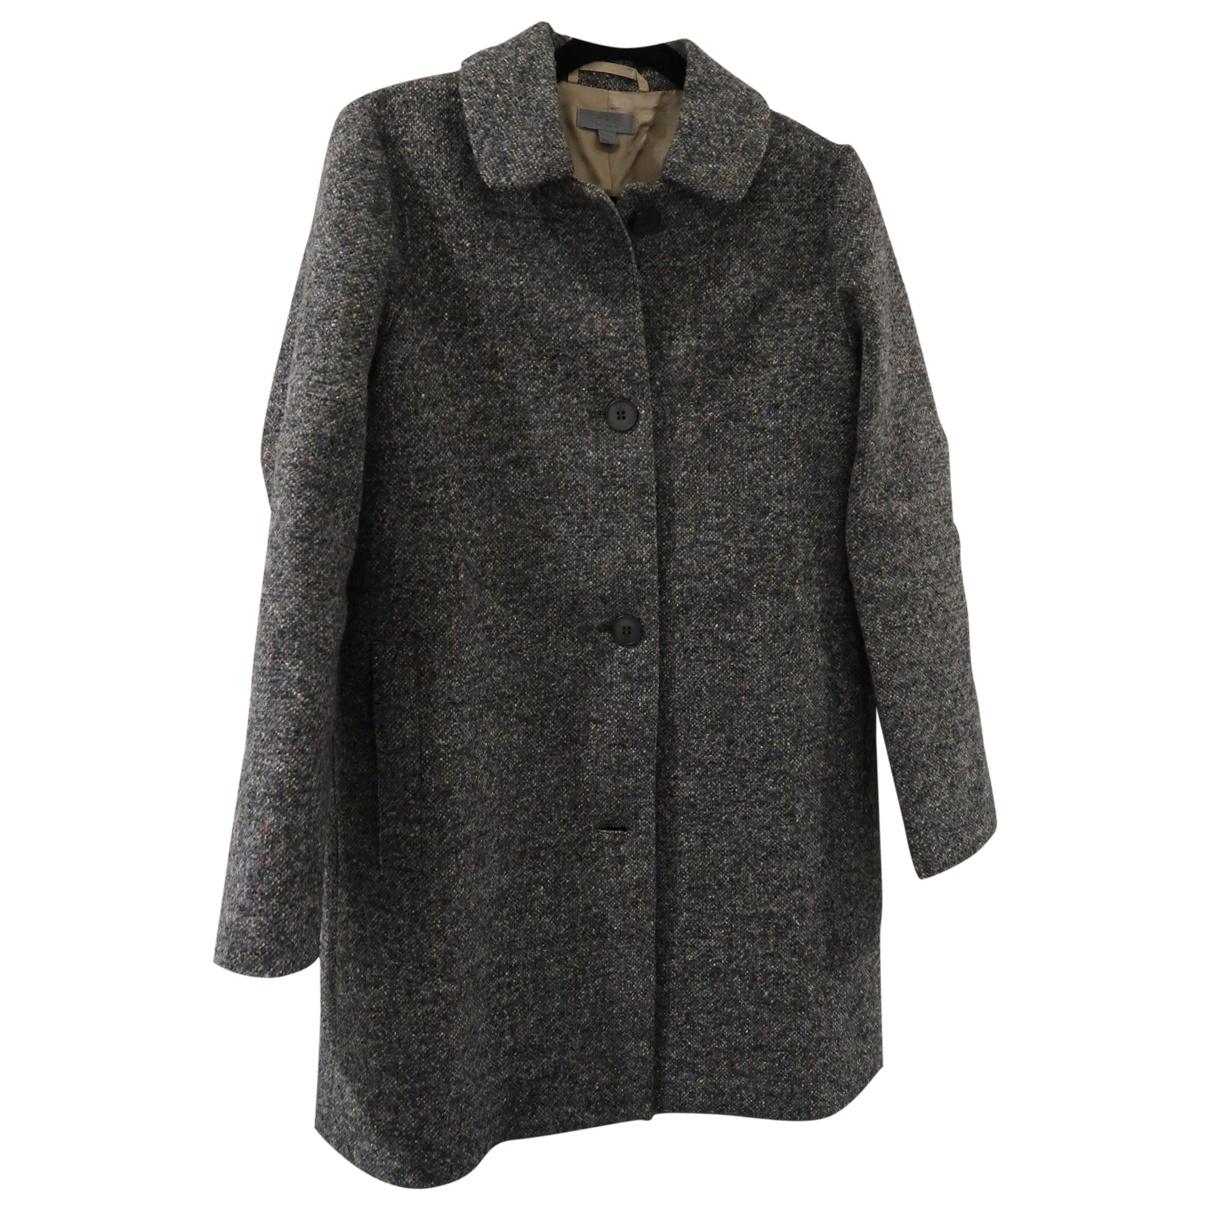 Cos \N Grey Wool coat for Women 34 FR